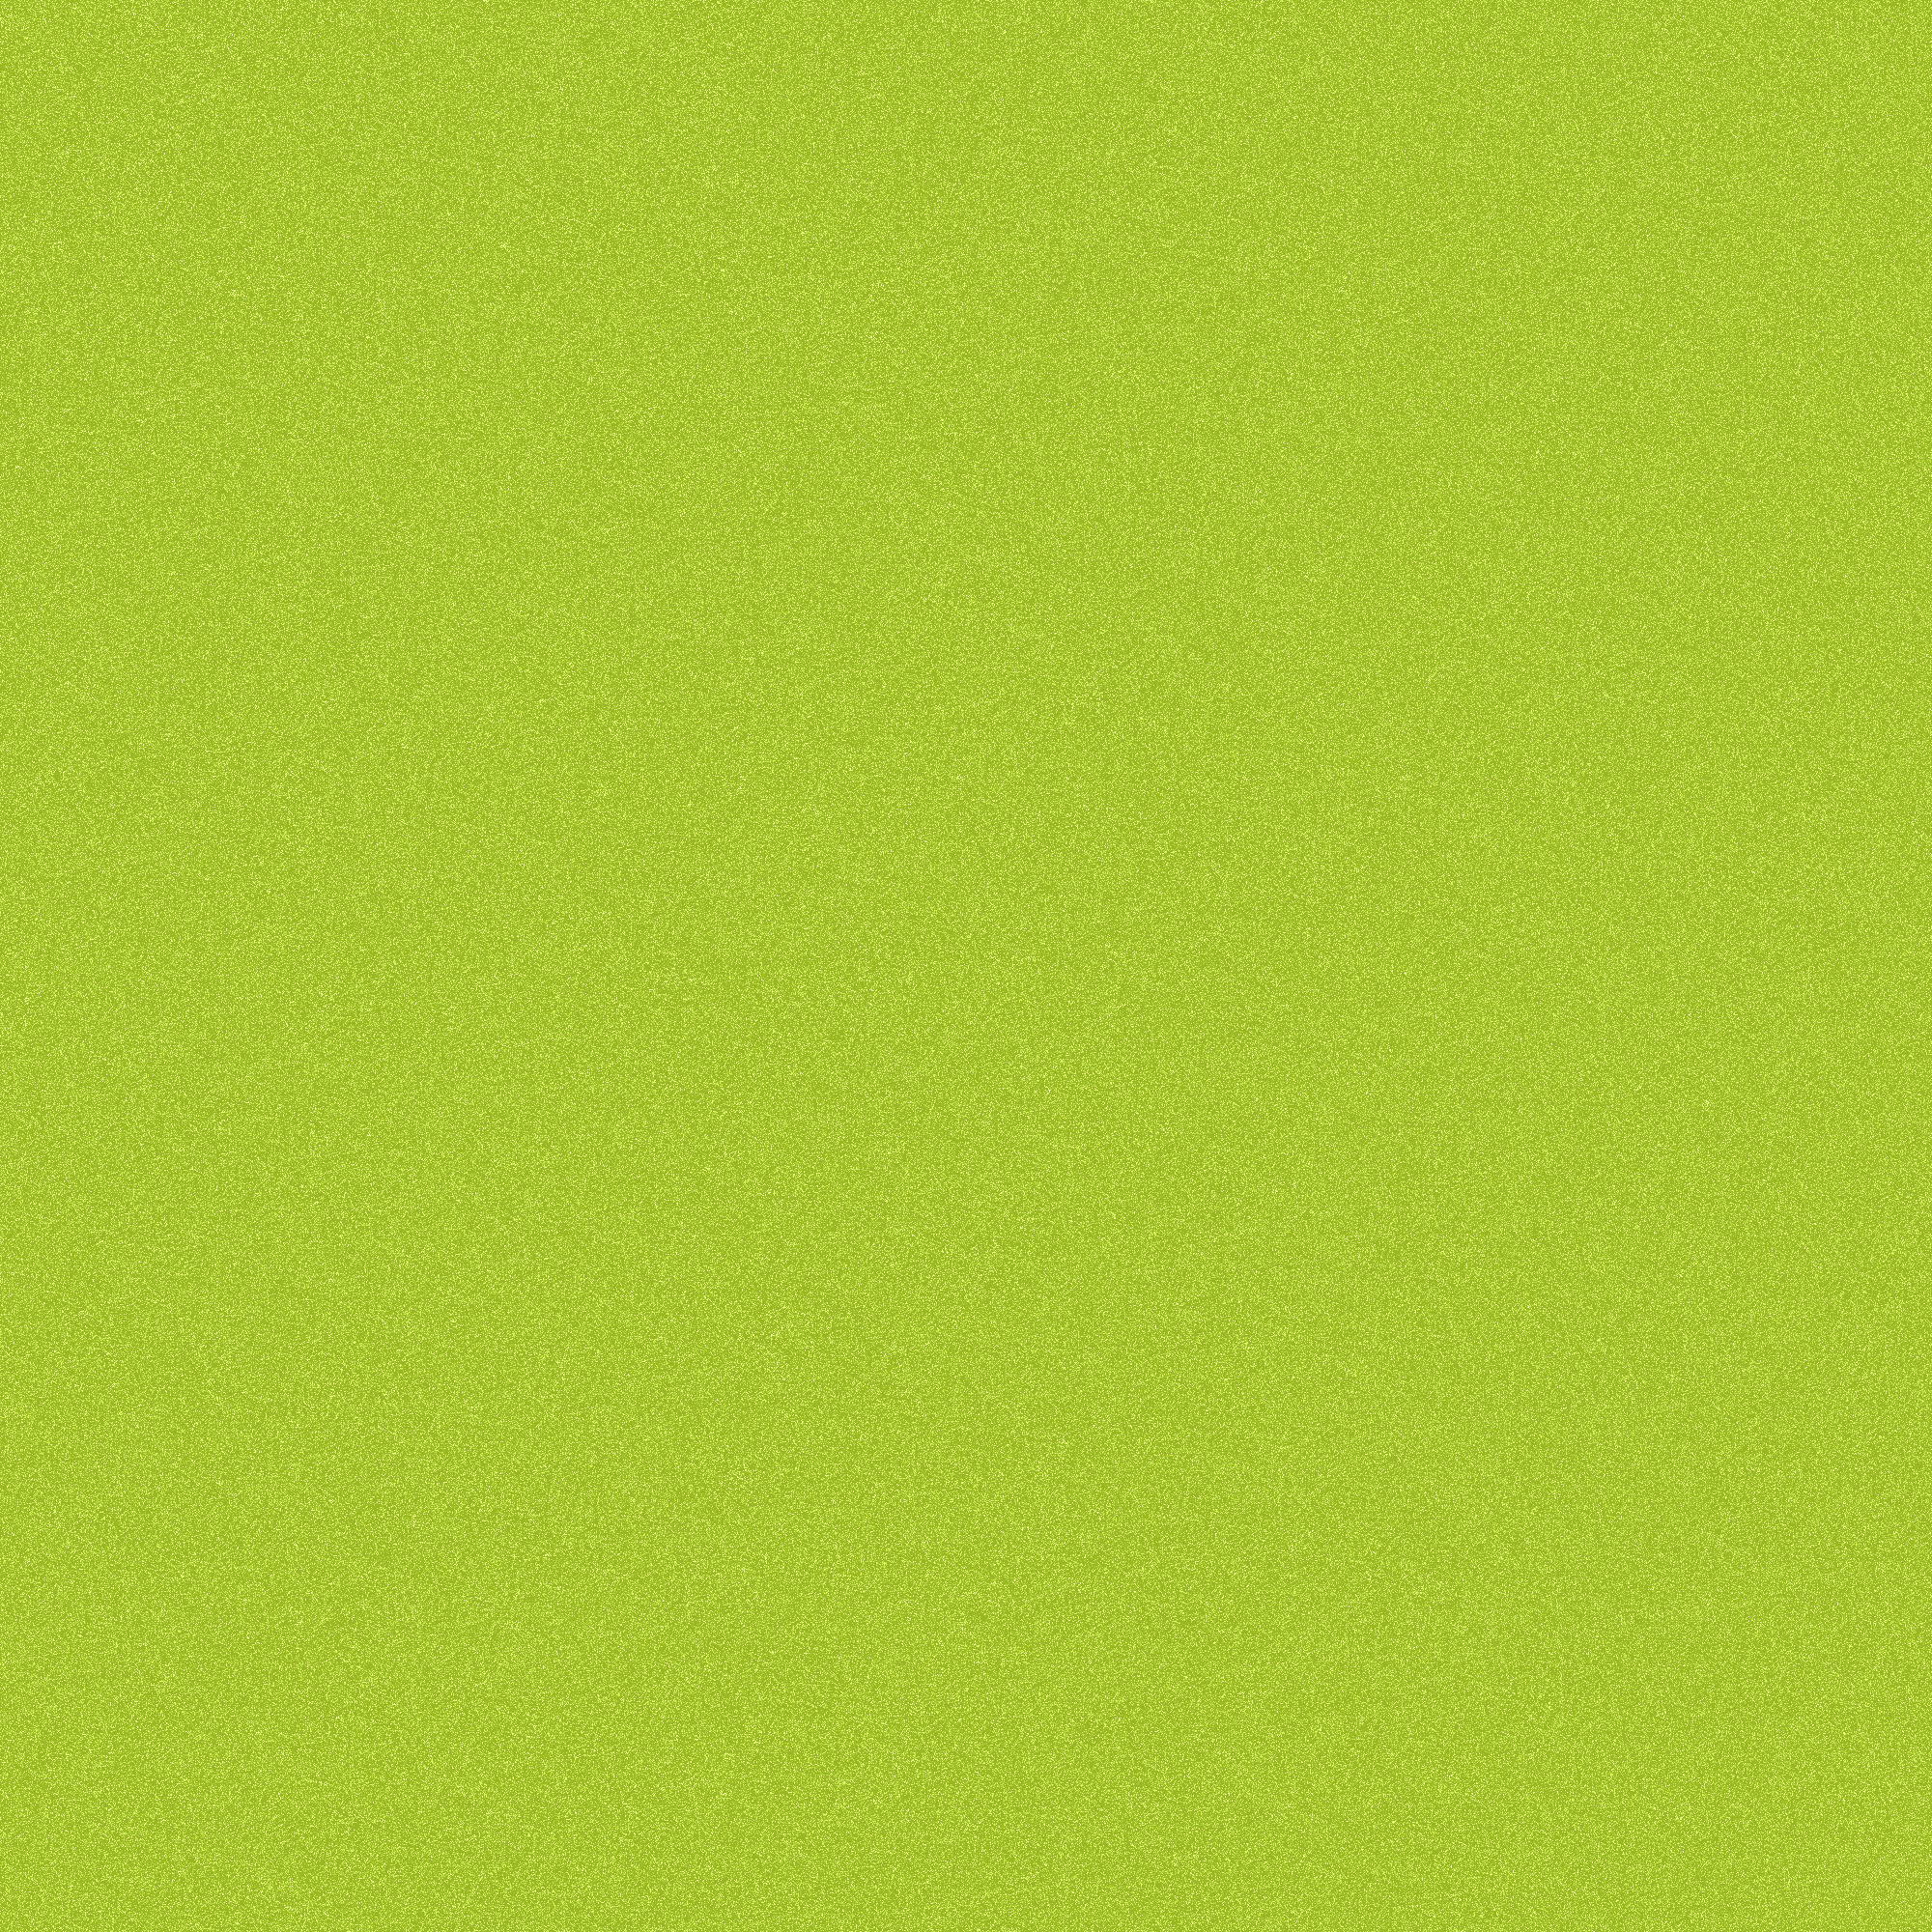 light green background design - photo #31